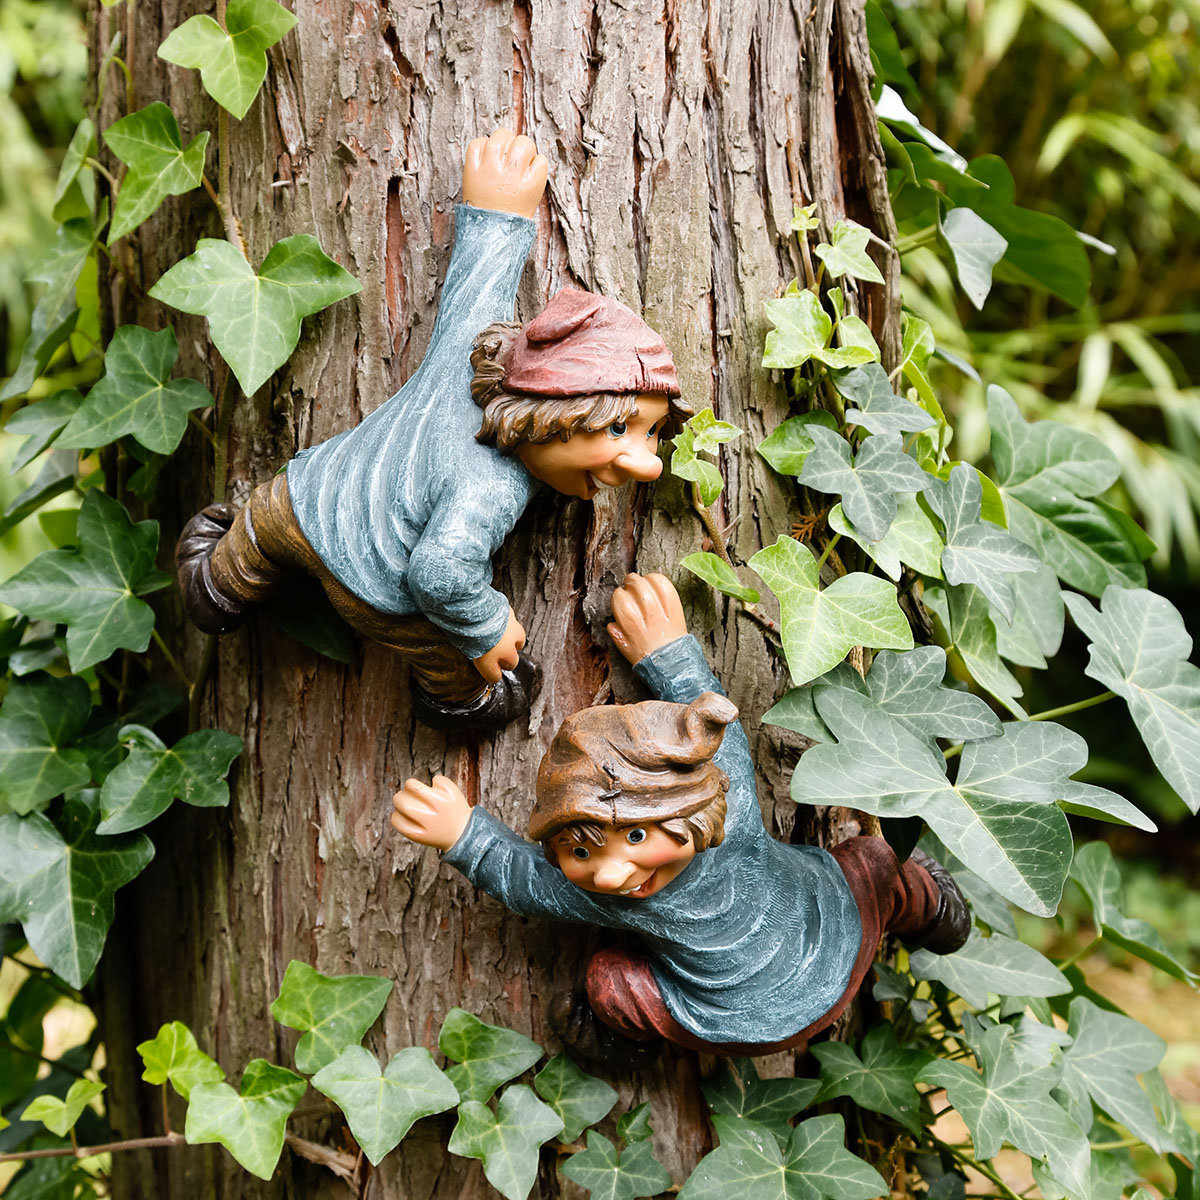 Gartenfigur Kletter-Gnom Tarzan | #2